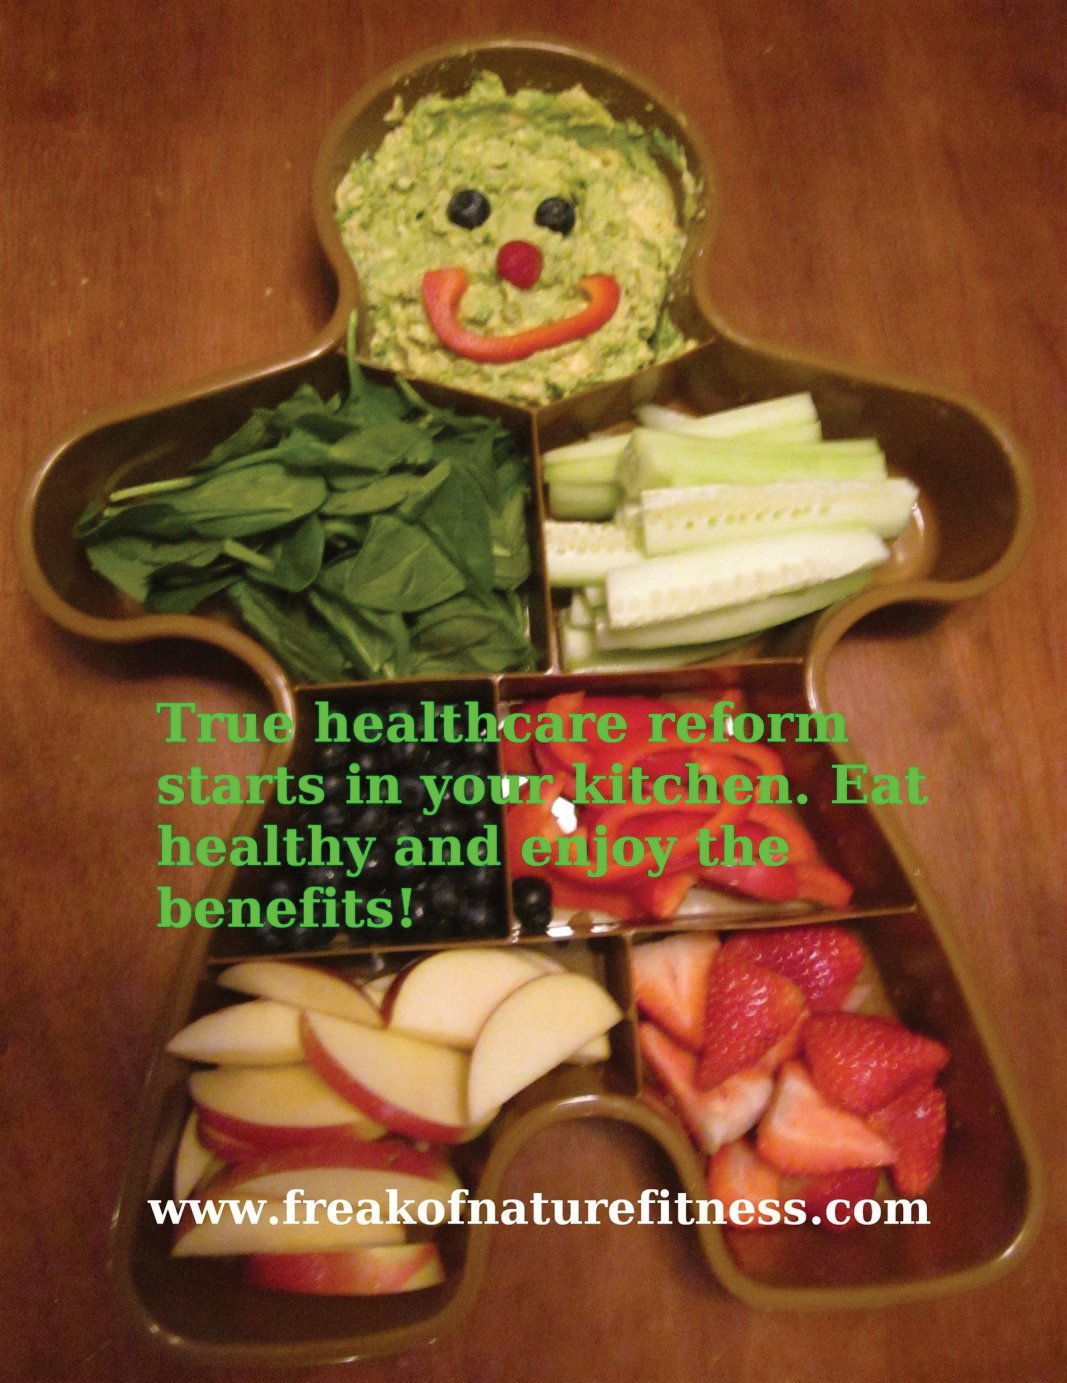 Healthy Eating For Kids, Get Fit, Wellness, Nutrition Facts, Motivation, Vegetables